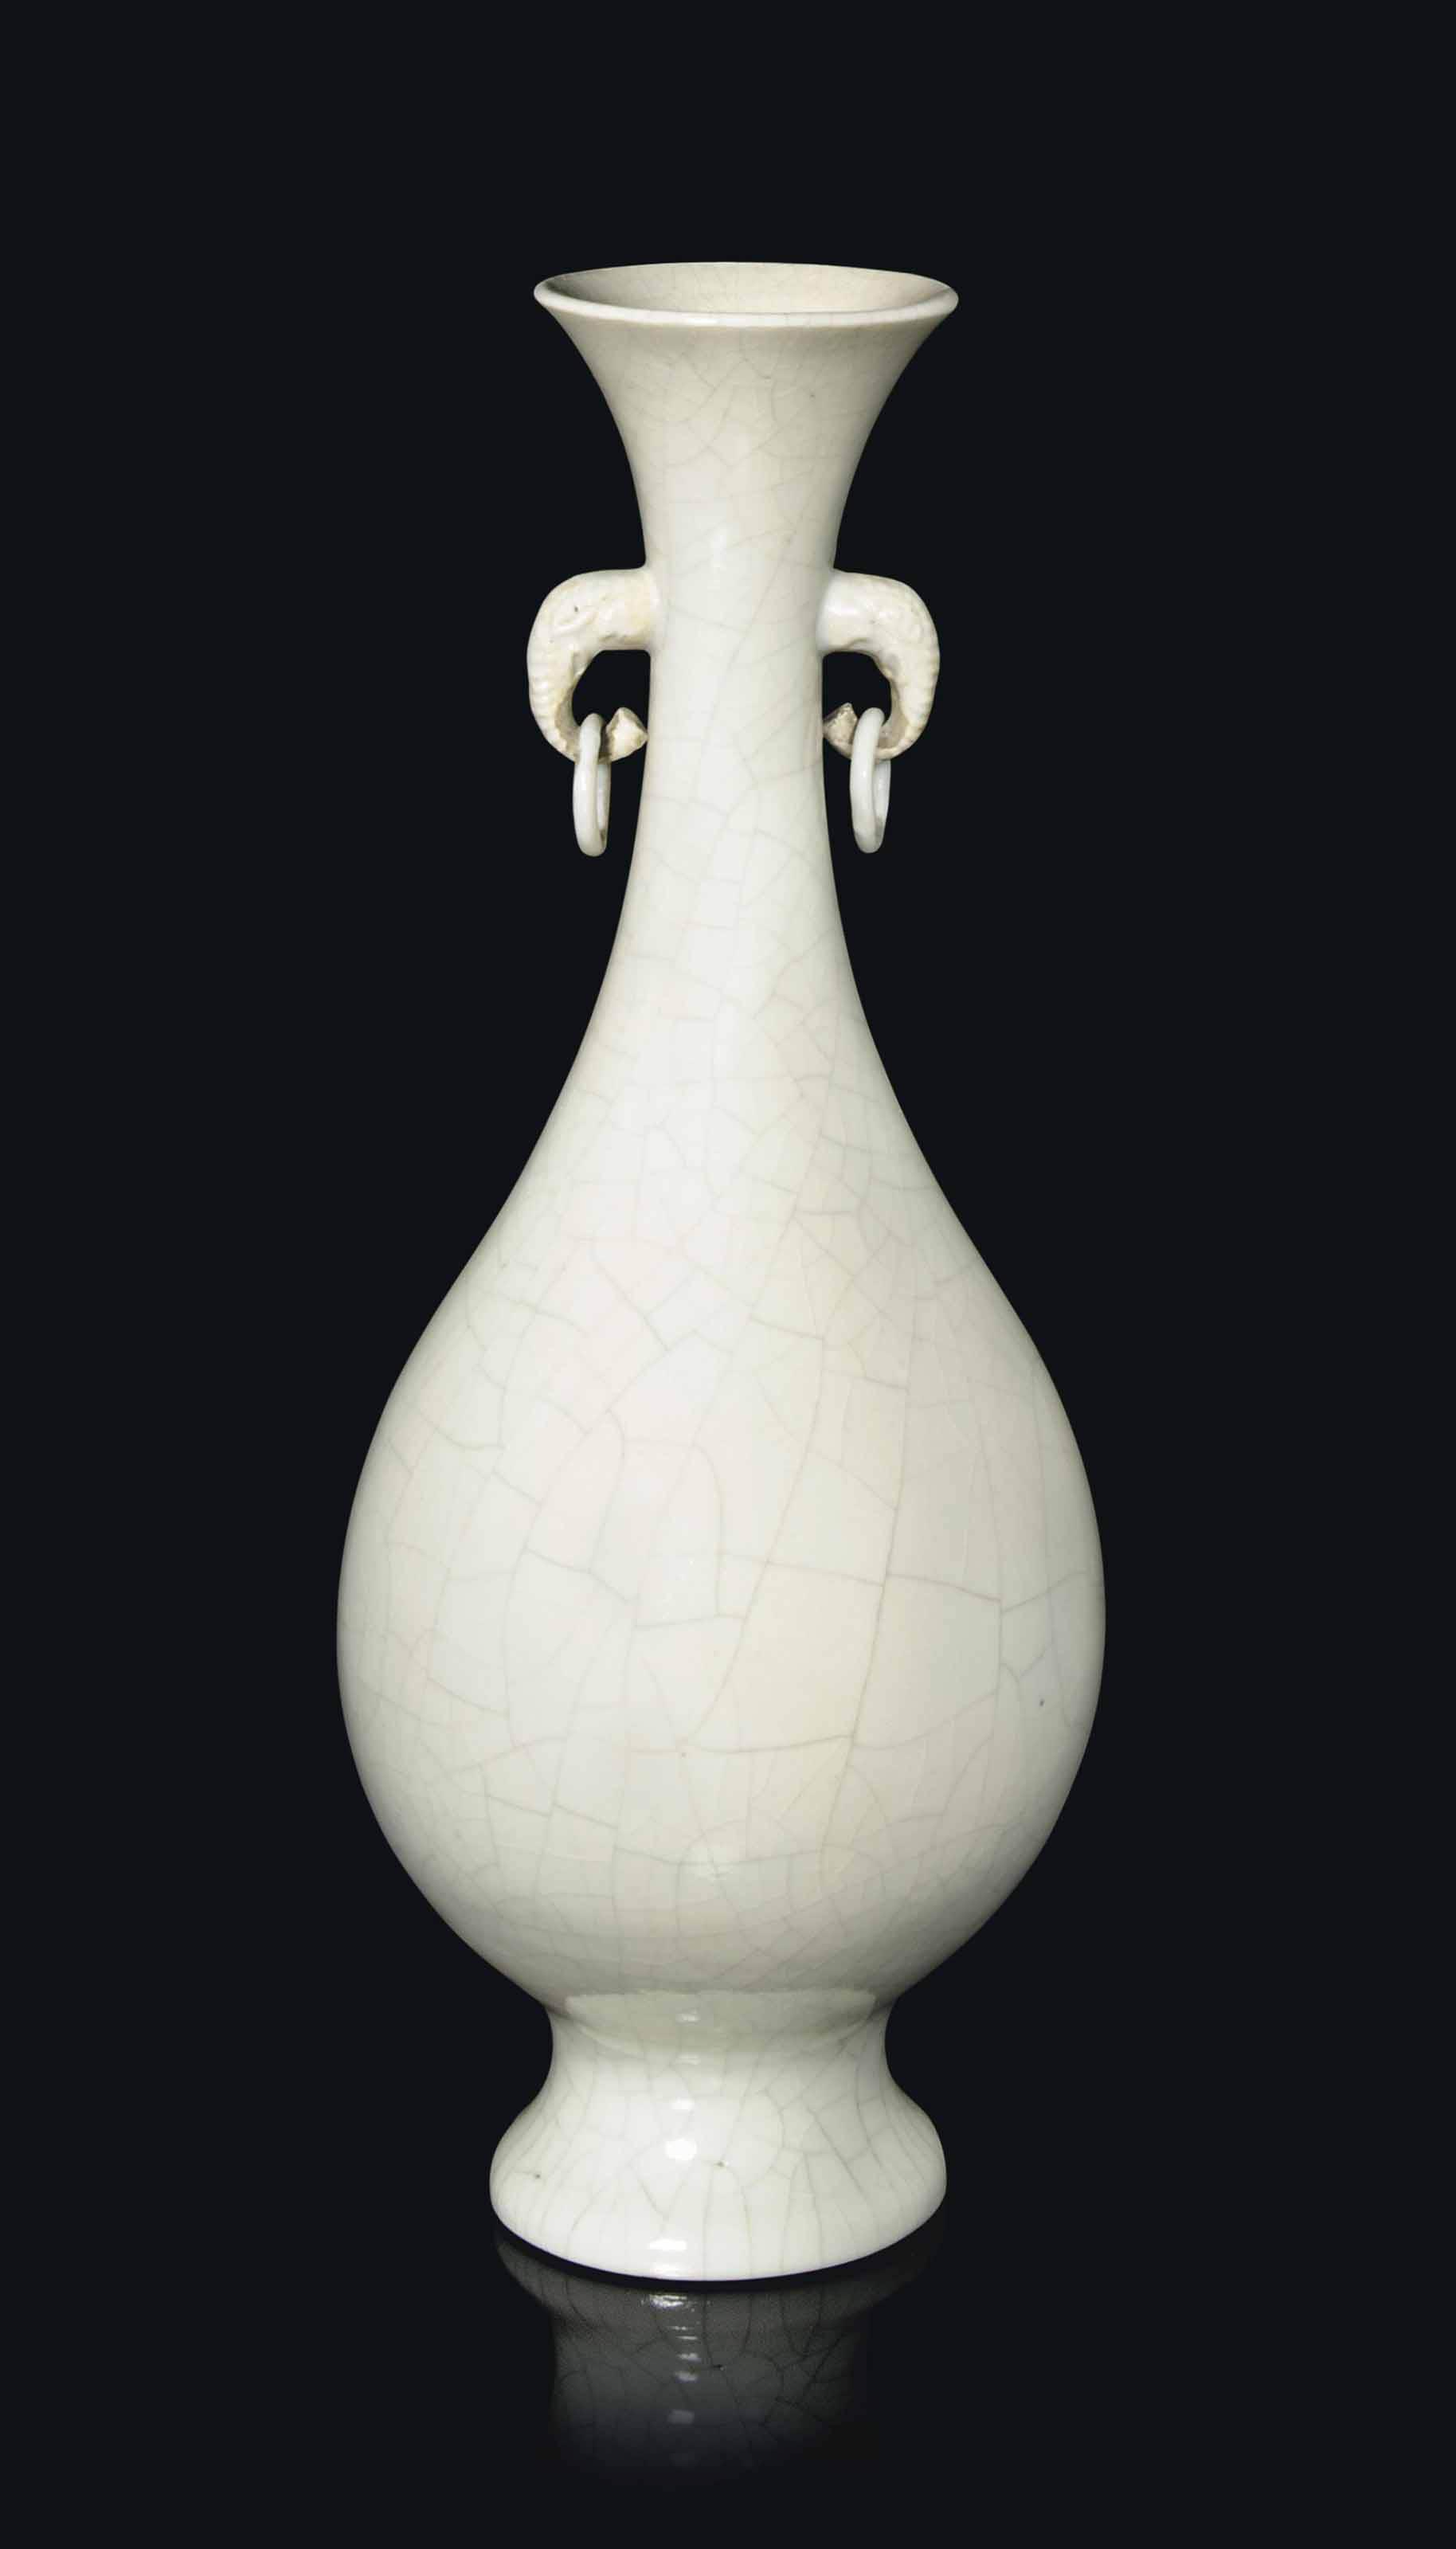 A CHINESE SOFTPASTE CRACKLE-GLAZED BOTTLE VASE